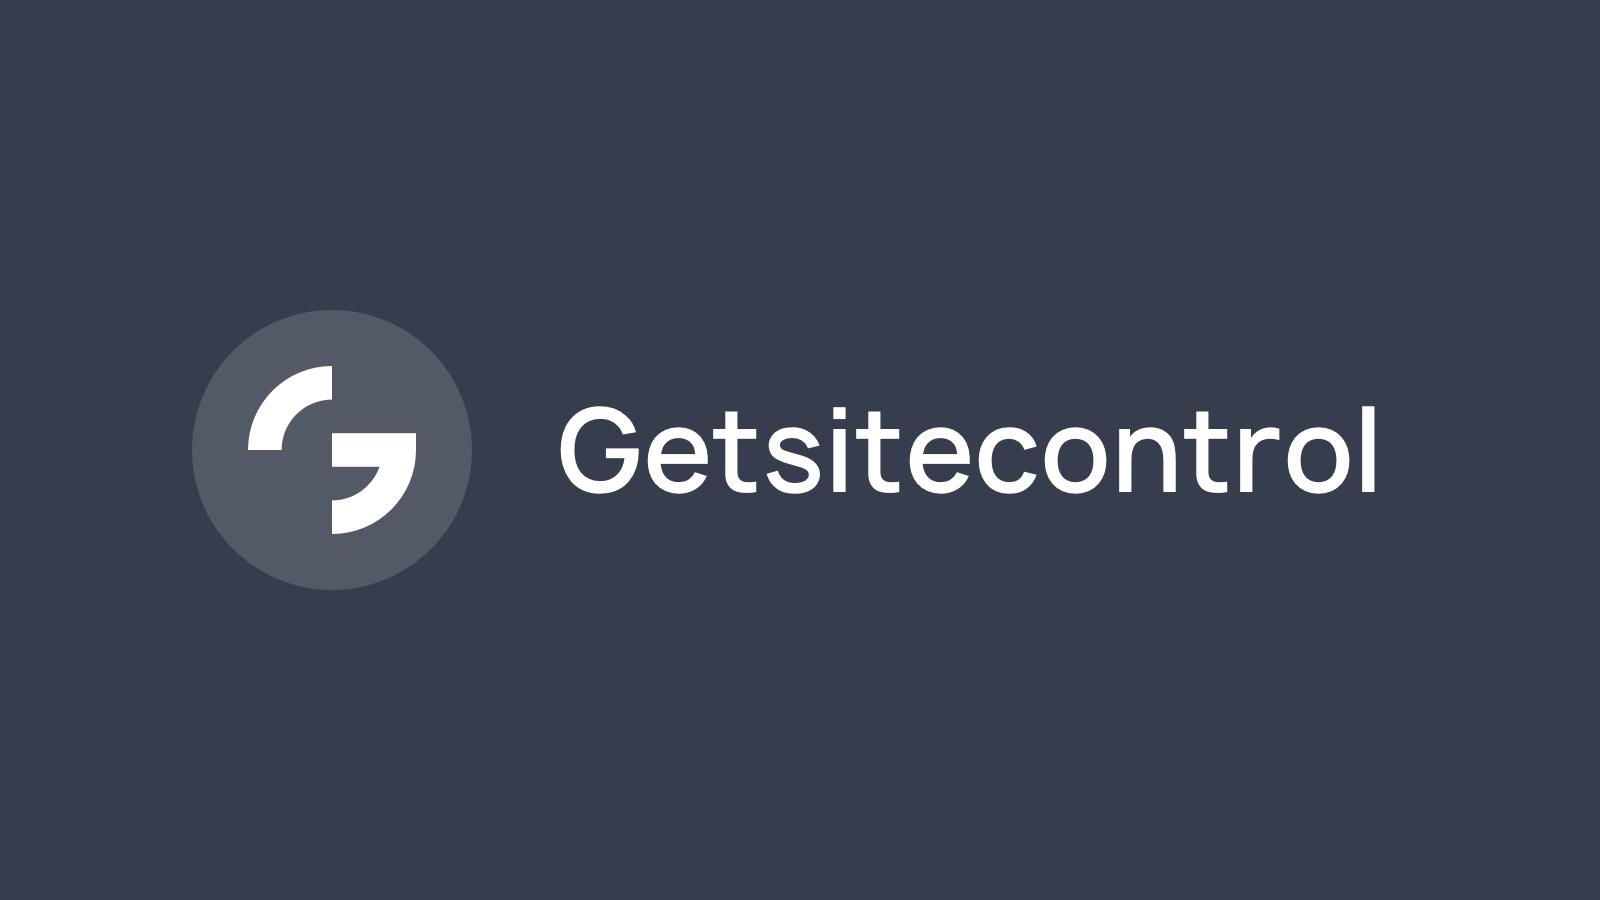 Getsitecontrol